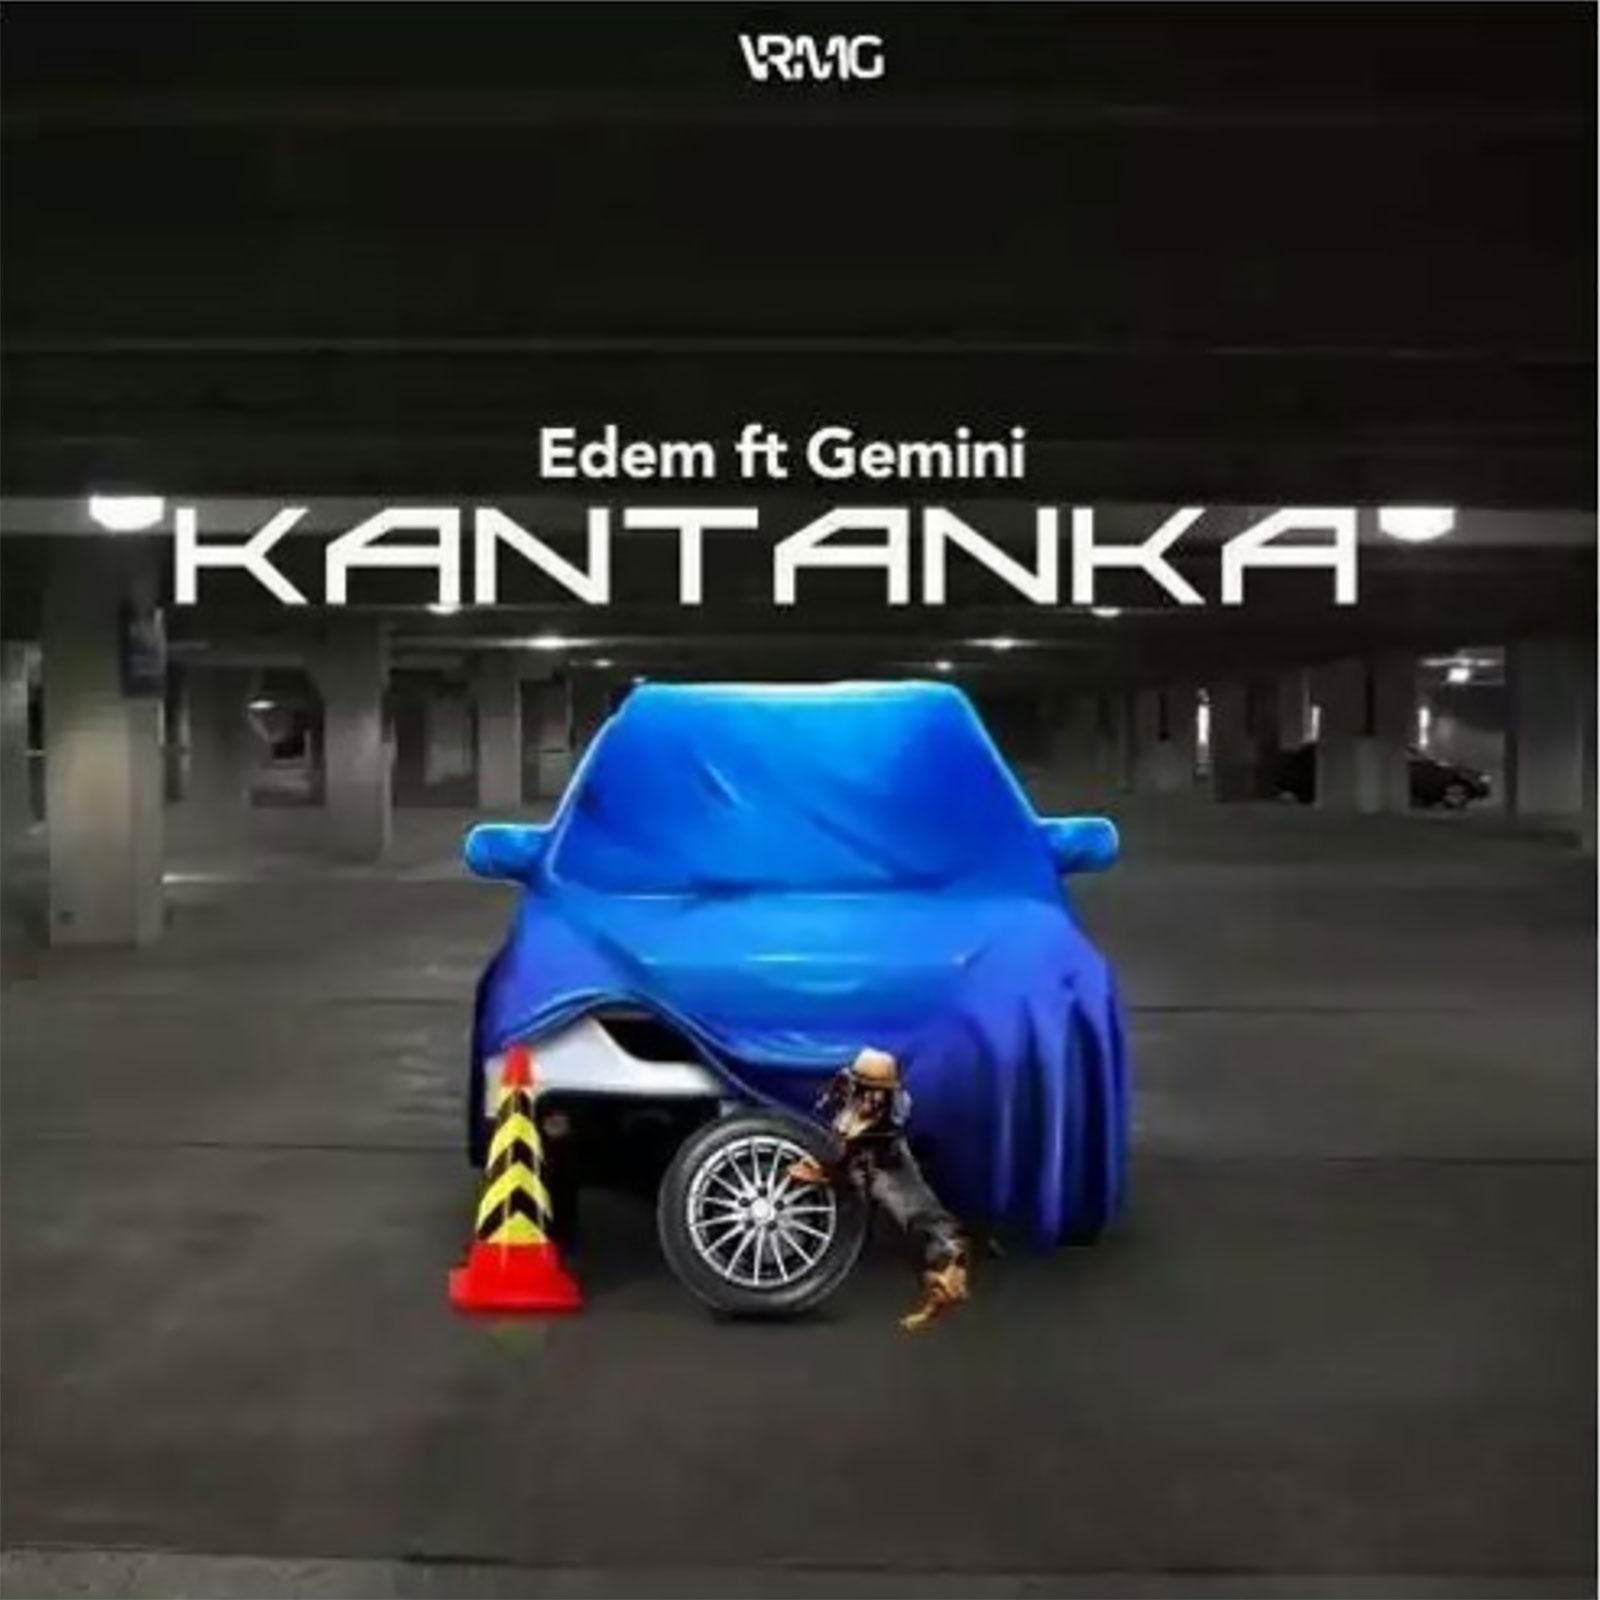 Kantanka by Edem feat. Gemini